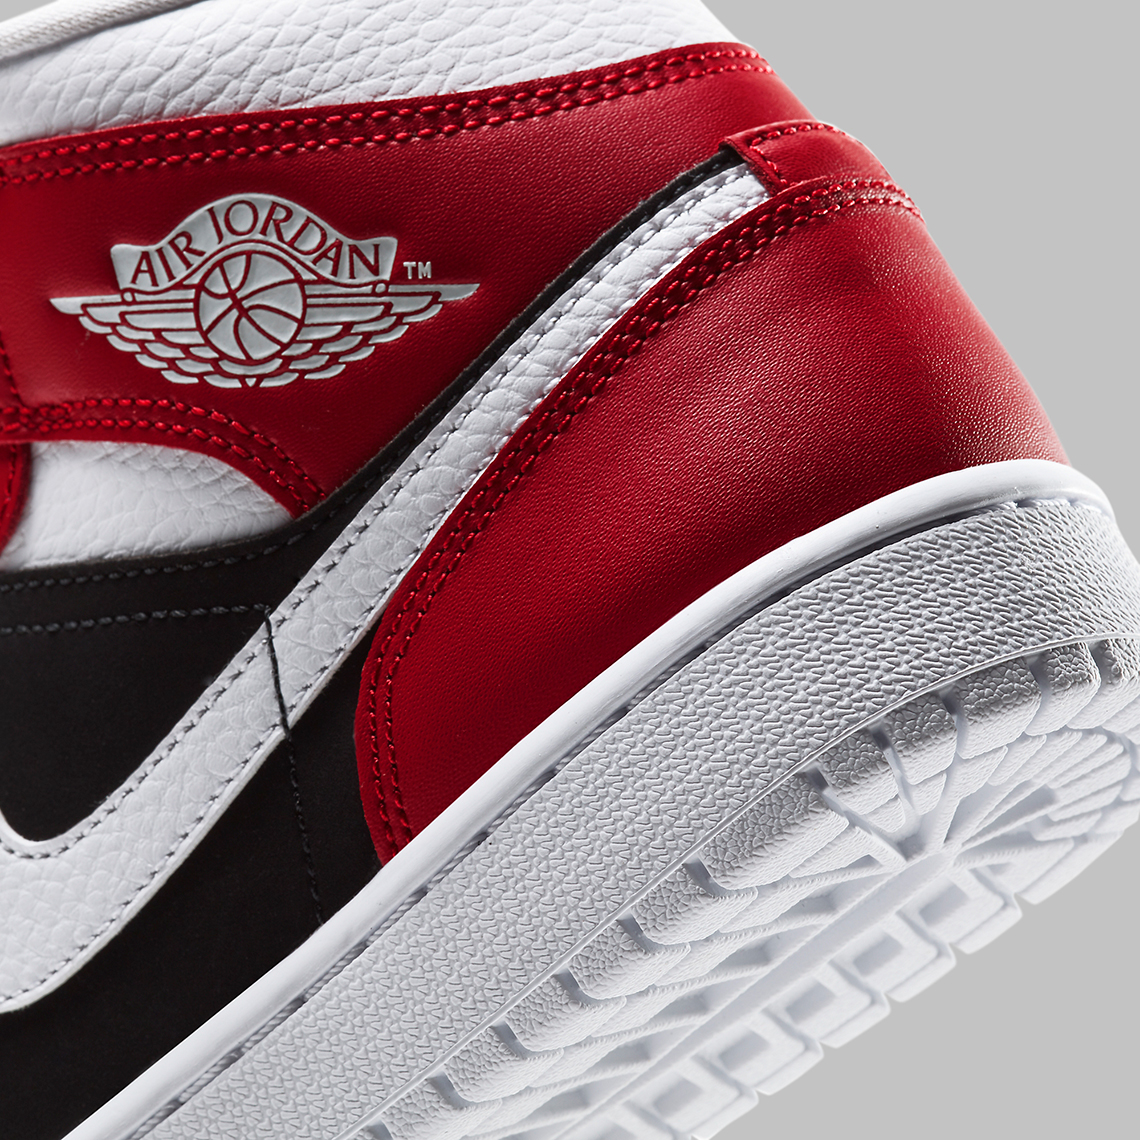 Air Jordan 1 Mid WMNS Gym Red Black BQ6472-601 | SneakerNews.com